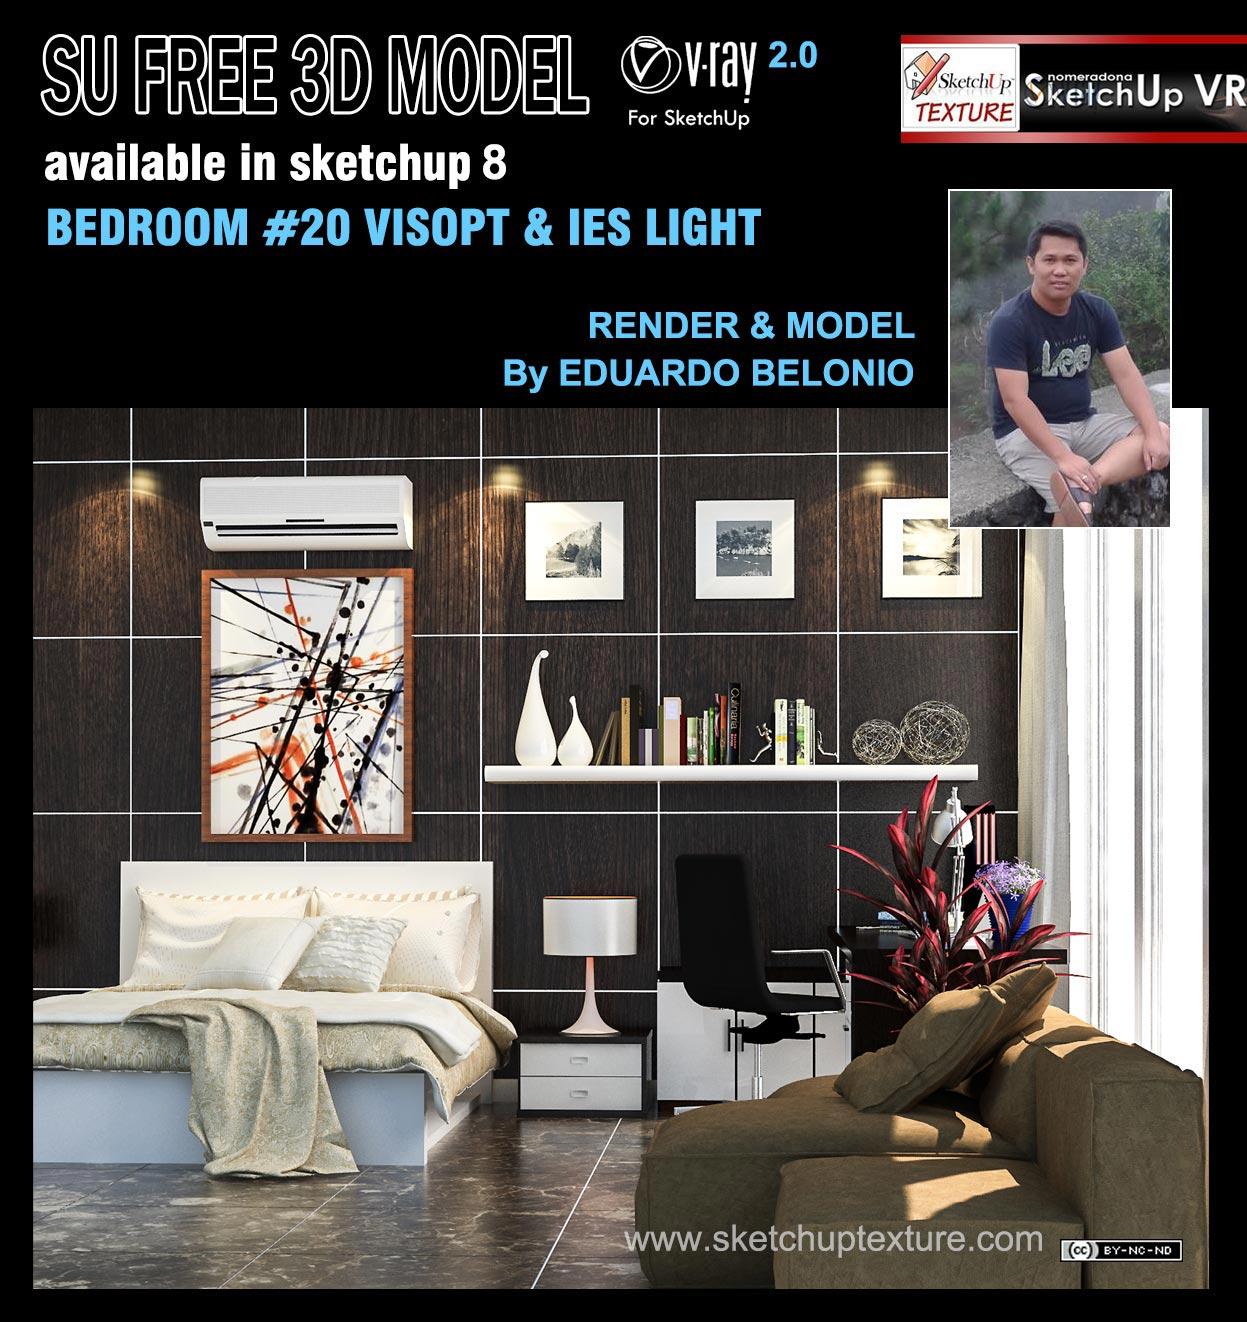 Free sketchup 3d model modern bedroom #20 & Visopt ...